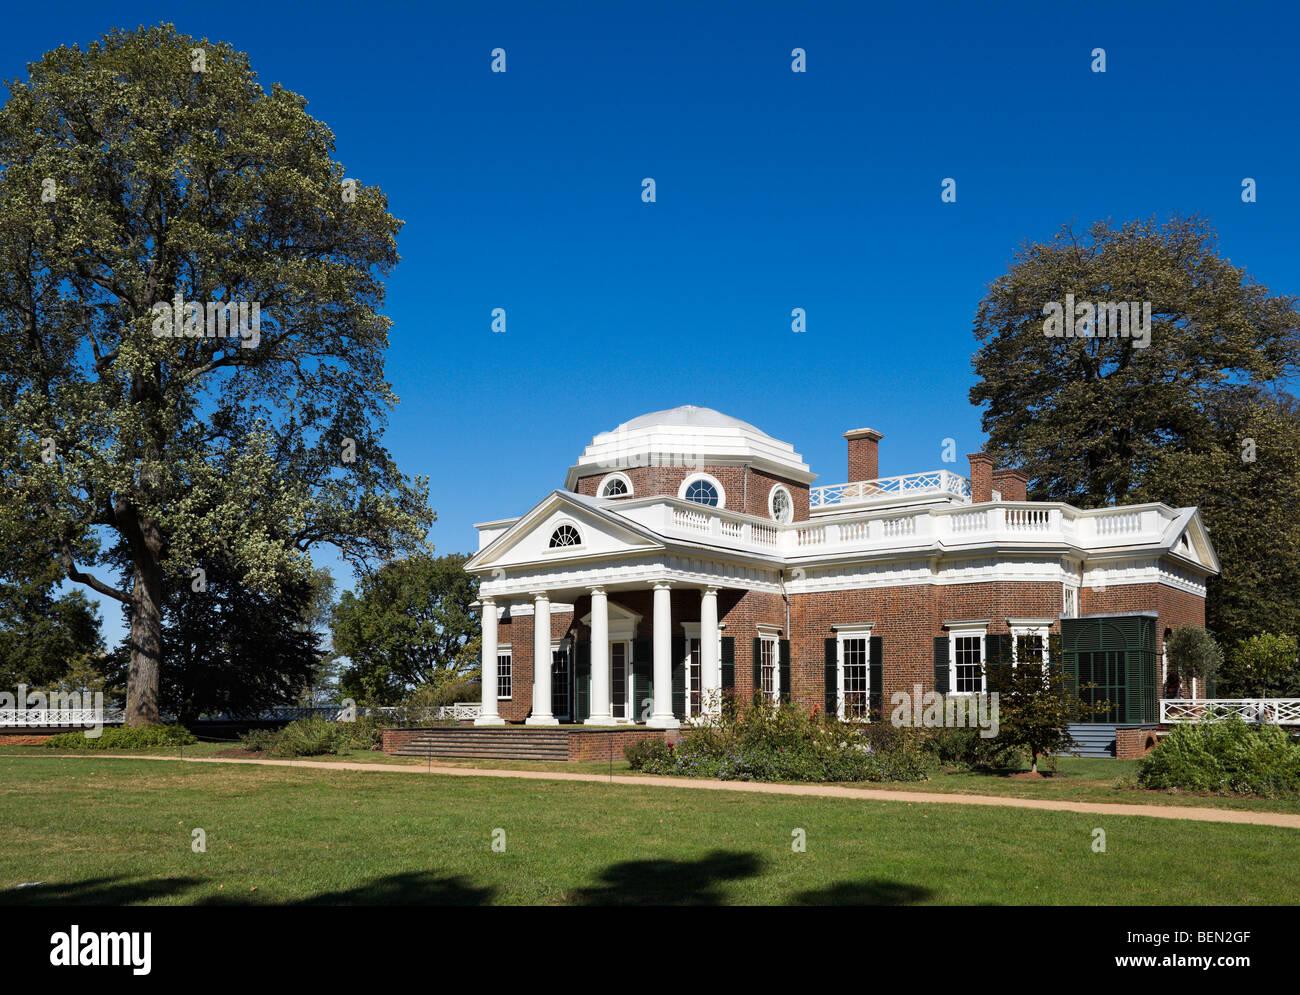 The home of Thomas Jefferson, Monticello, Charlottesville, Virginia, USA - Stock Image